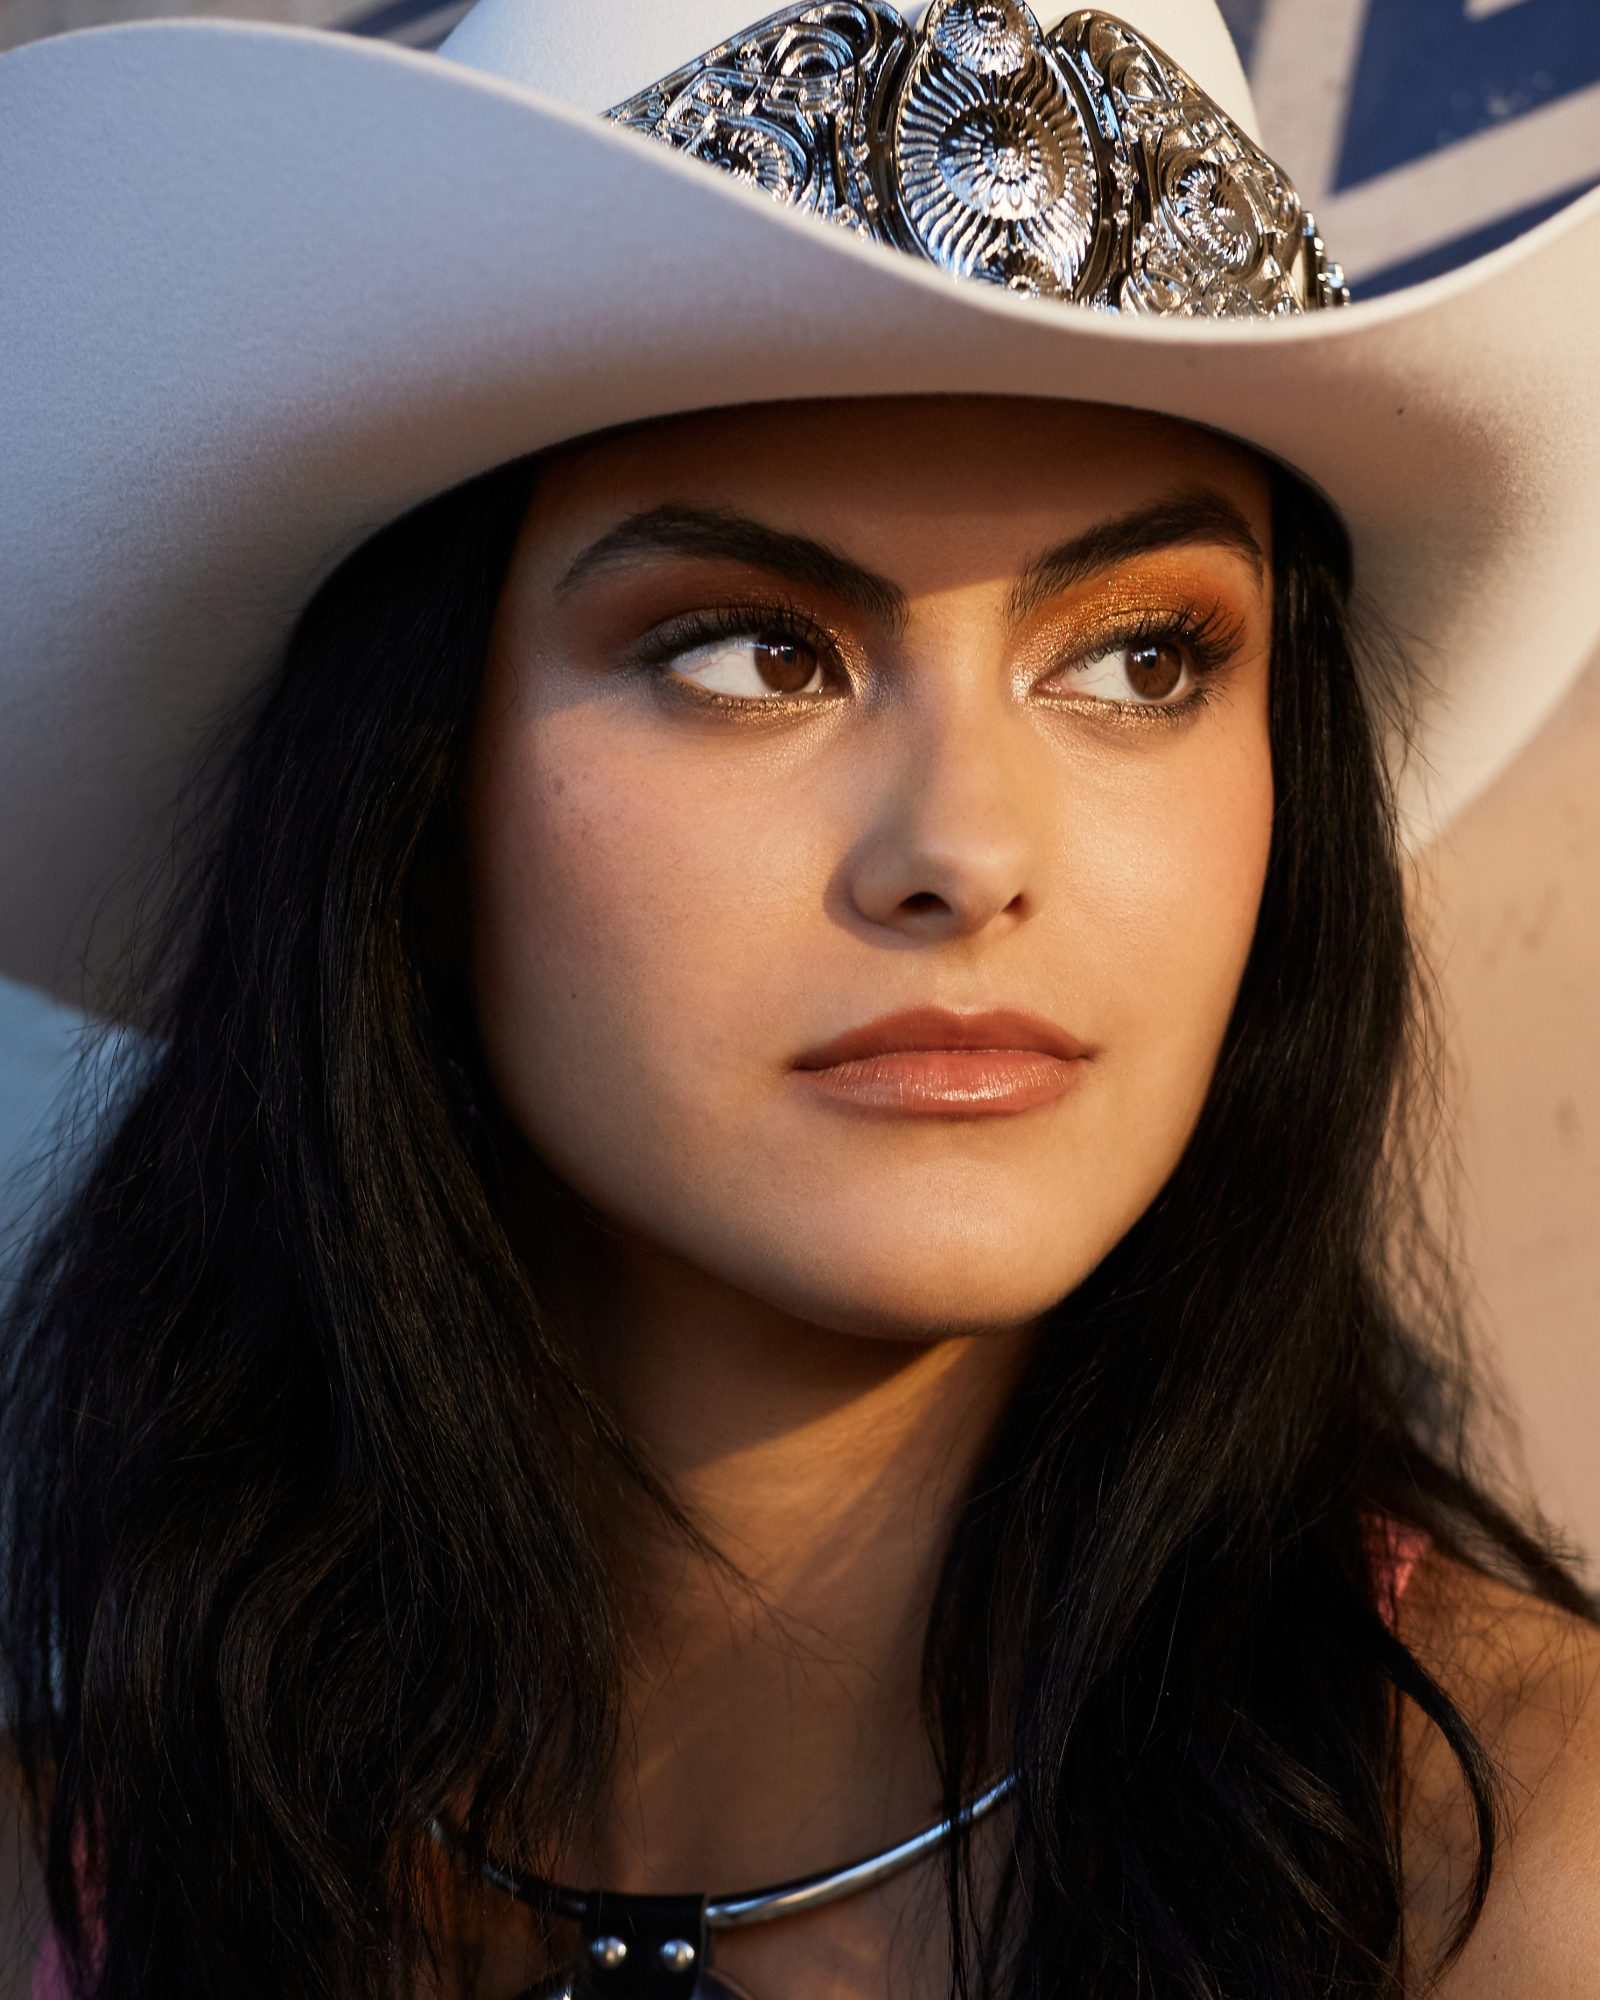 Camila Mendes Cowboy hat